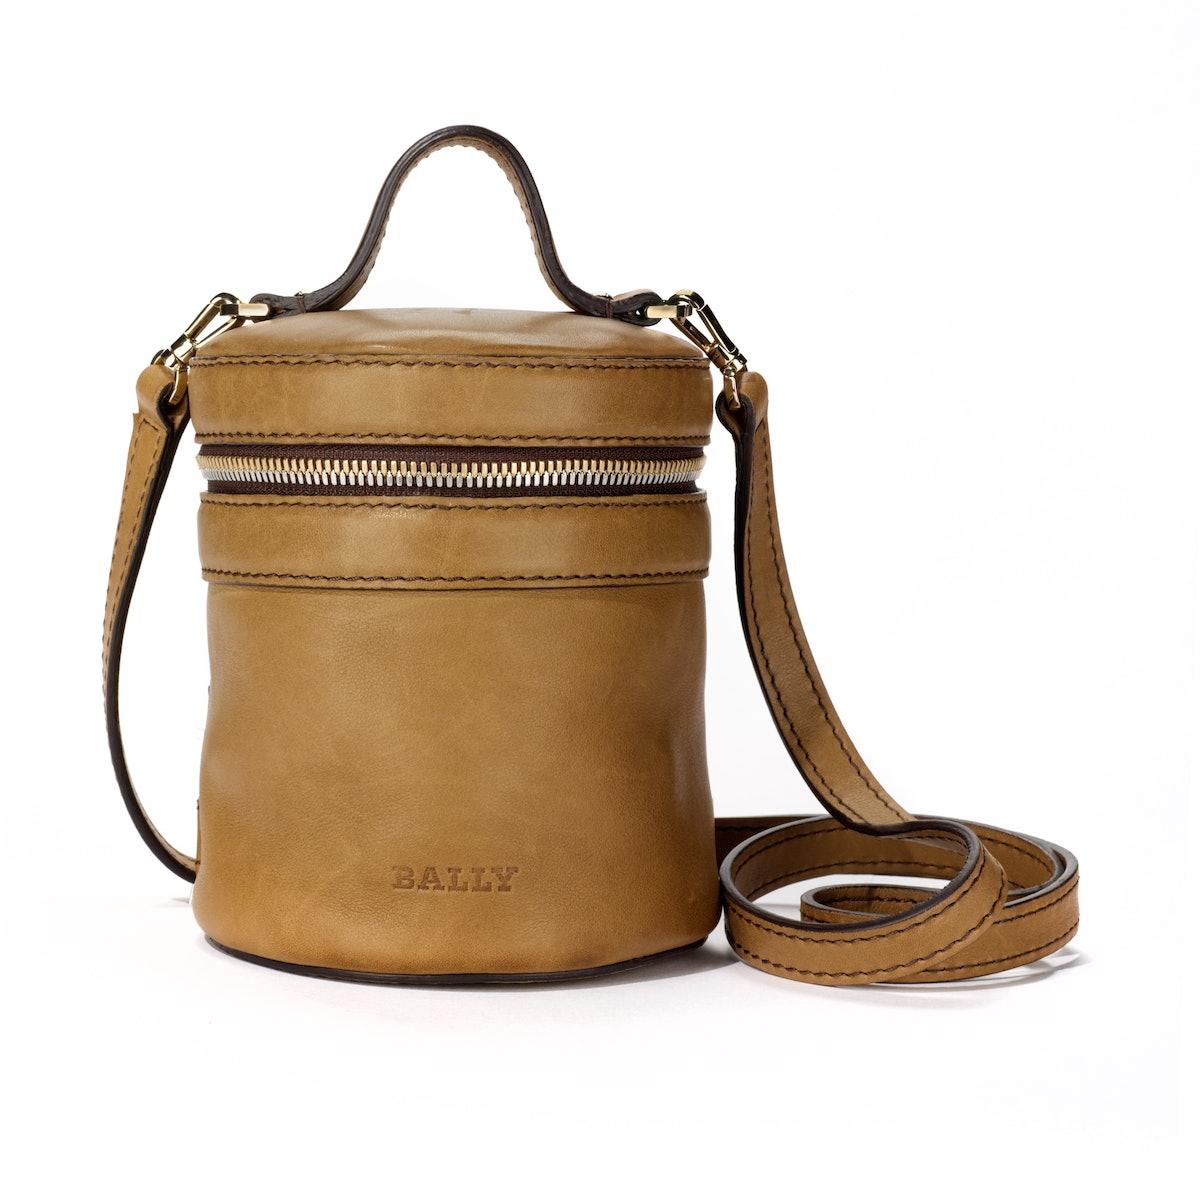 Bally bag, $690, [bally.com](http://www.bally.com/BALLY/search/BAGS/woman/season/main/tskay/BCAD6A87/c/cat_441/gender/D).